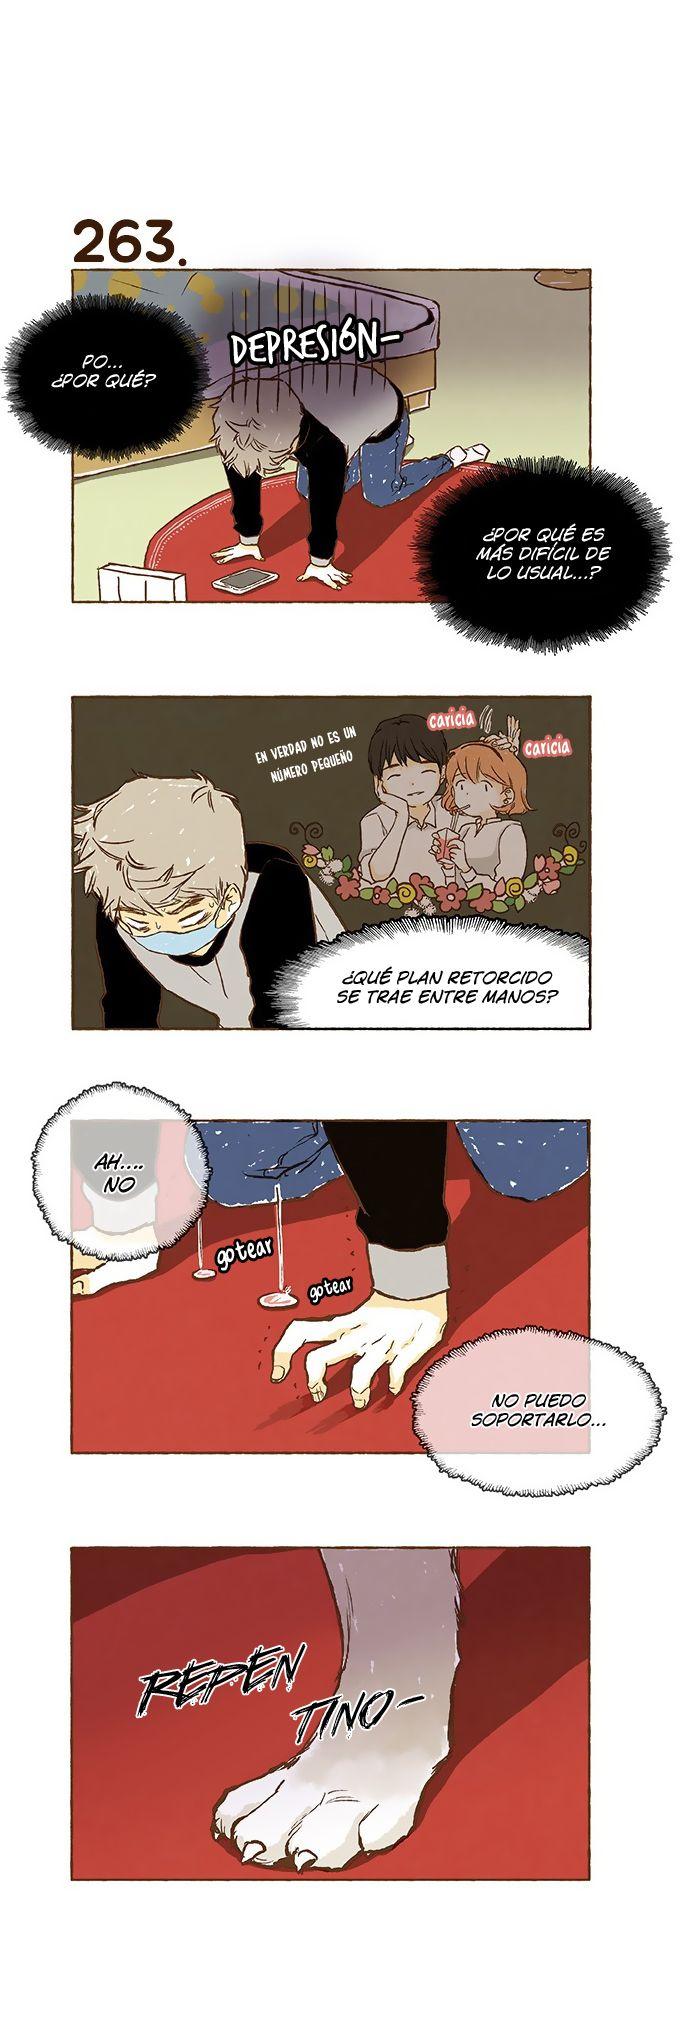 http://c5.ninemanga.com/es_manga/pic2/61/17725/527882/47267ca39f652c0de27a4b27c5e11c40.jpg Page 3